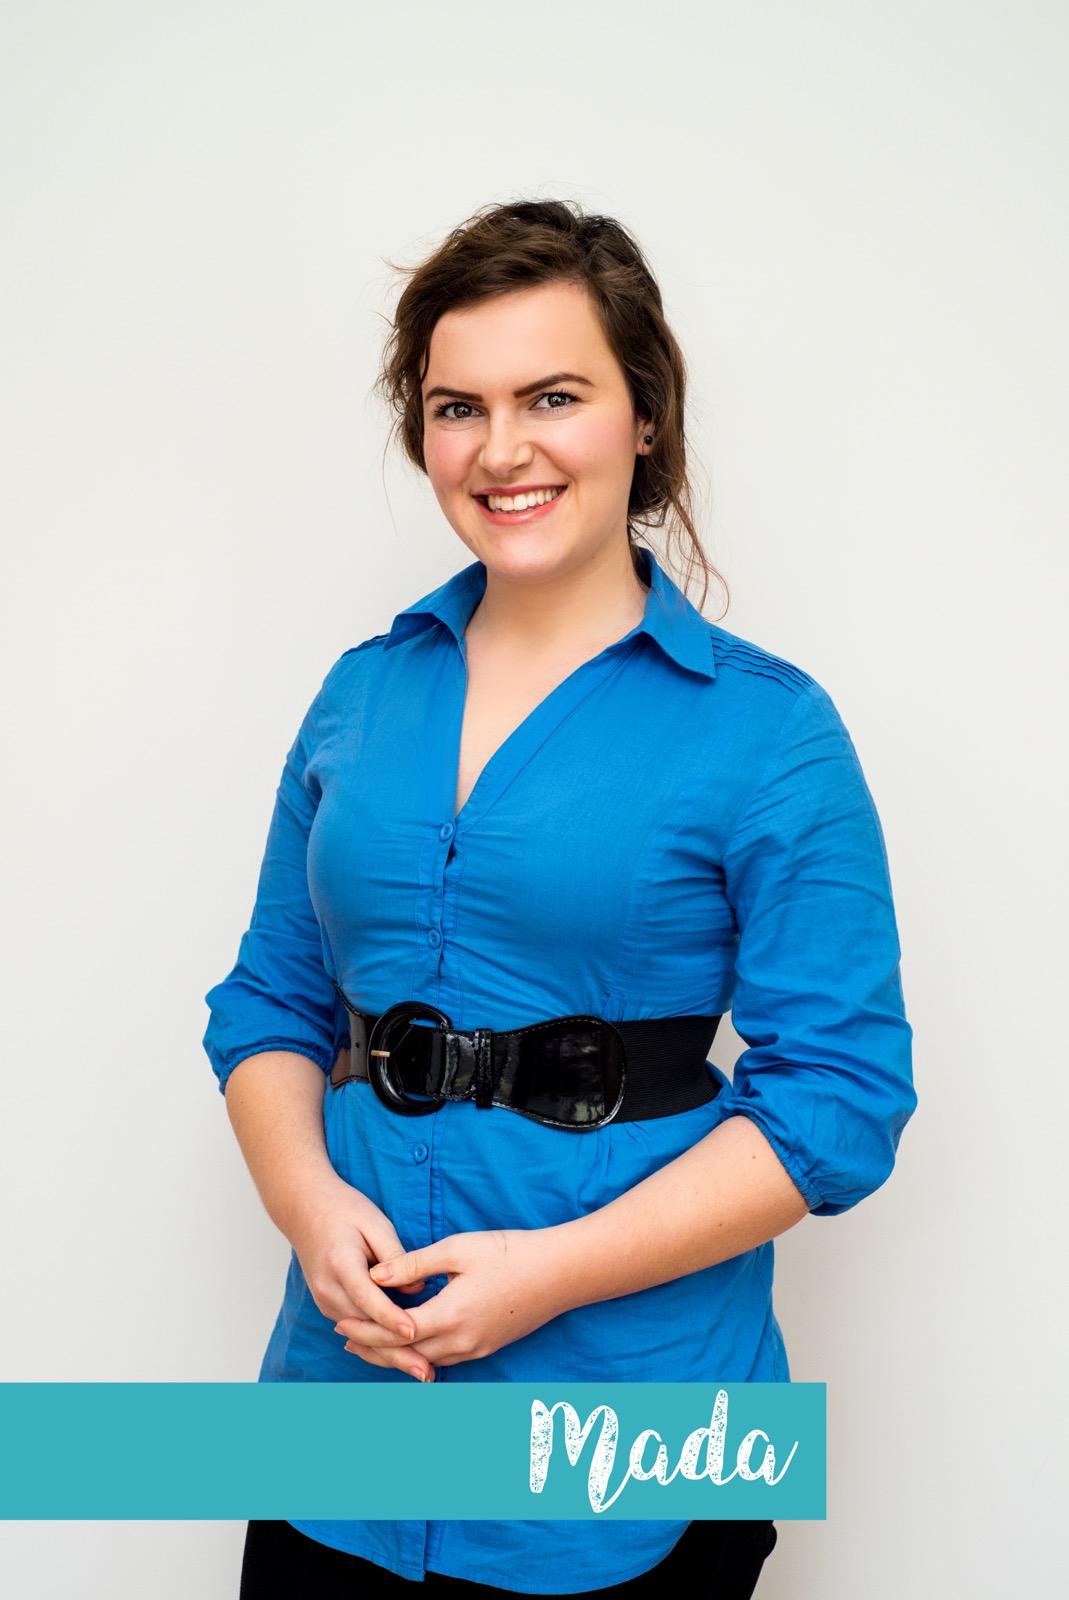 Madalina Stancu